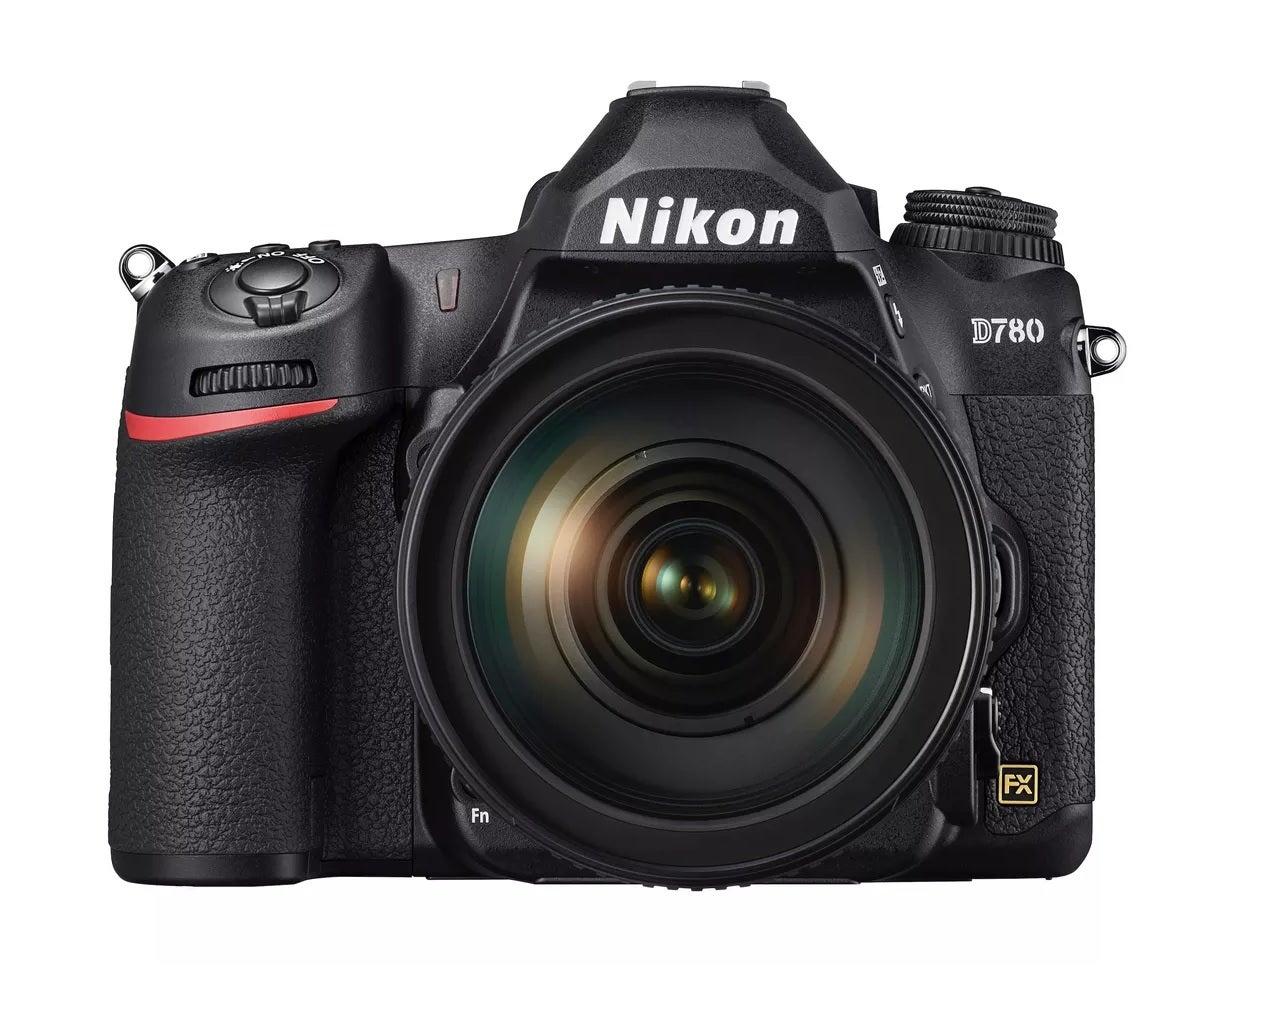 Nikon D780 Digital Camera